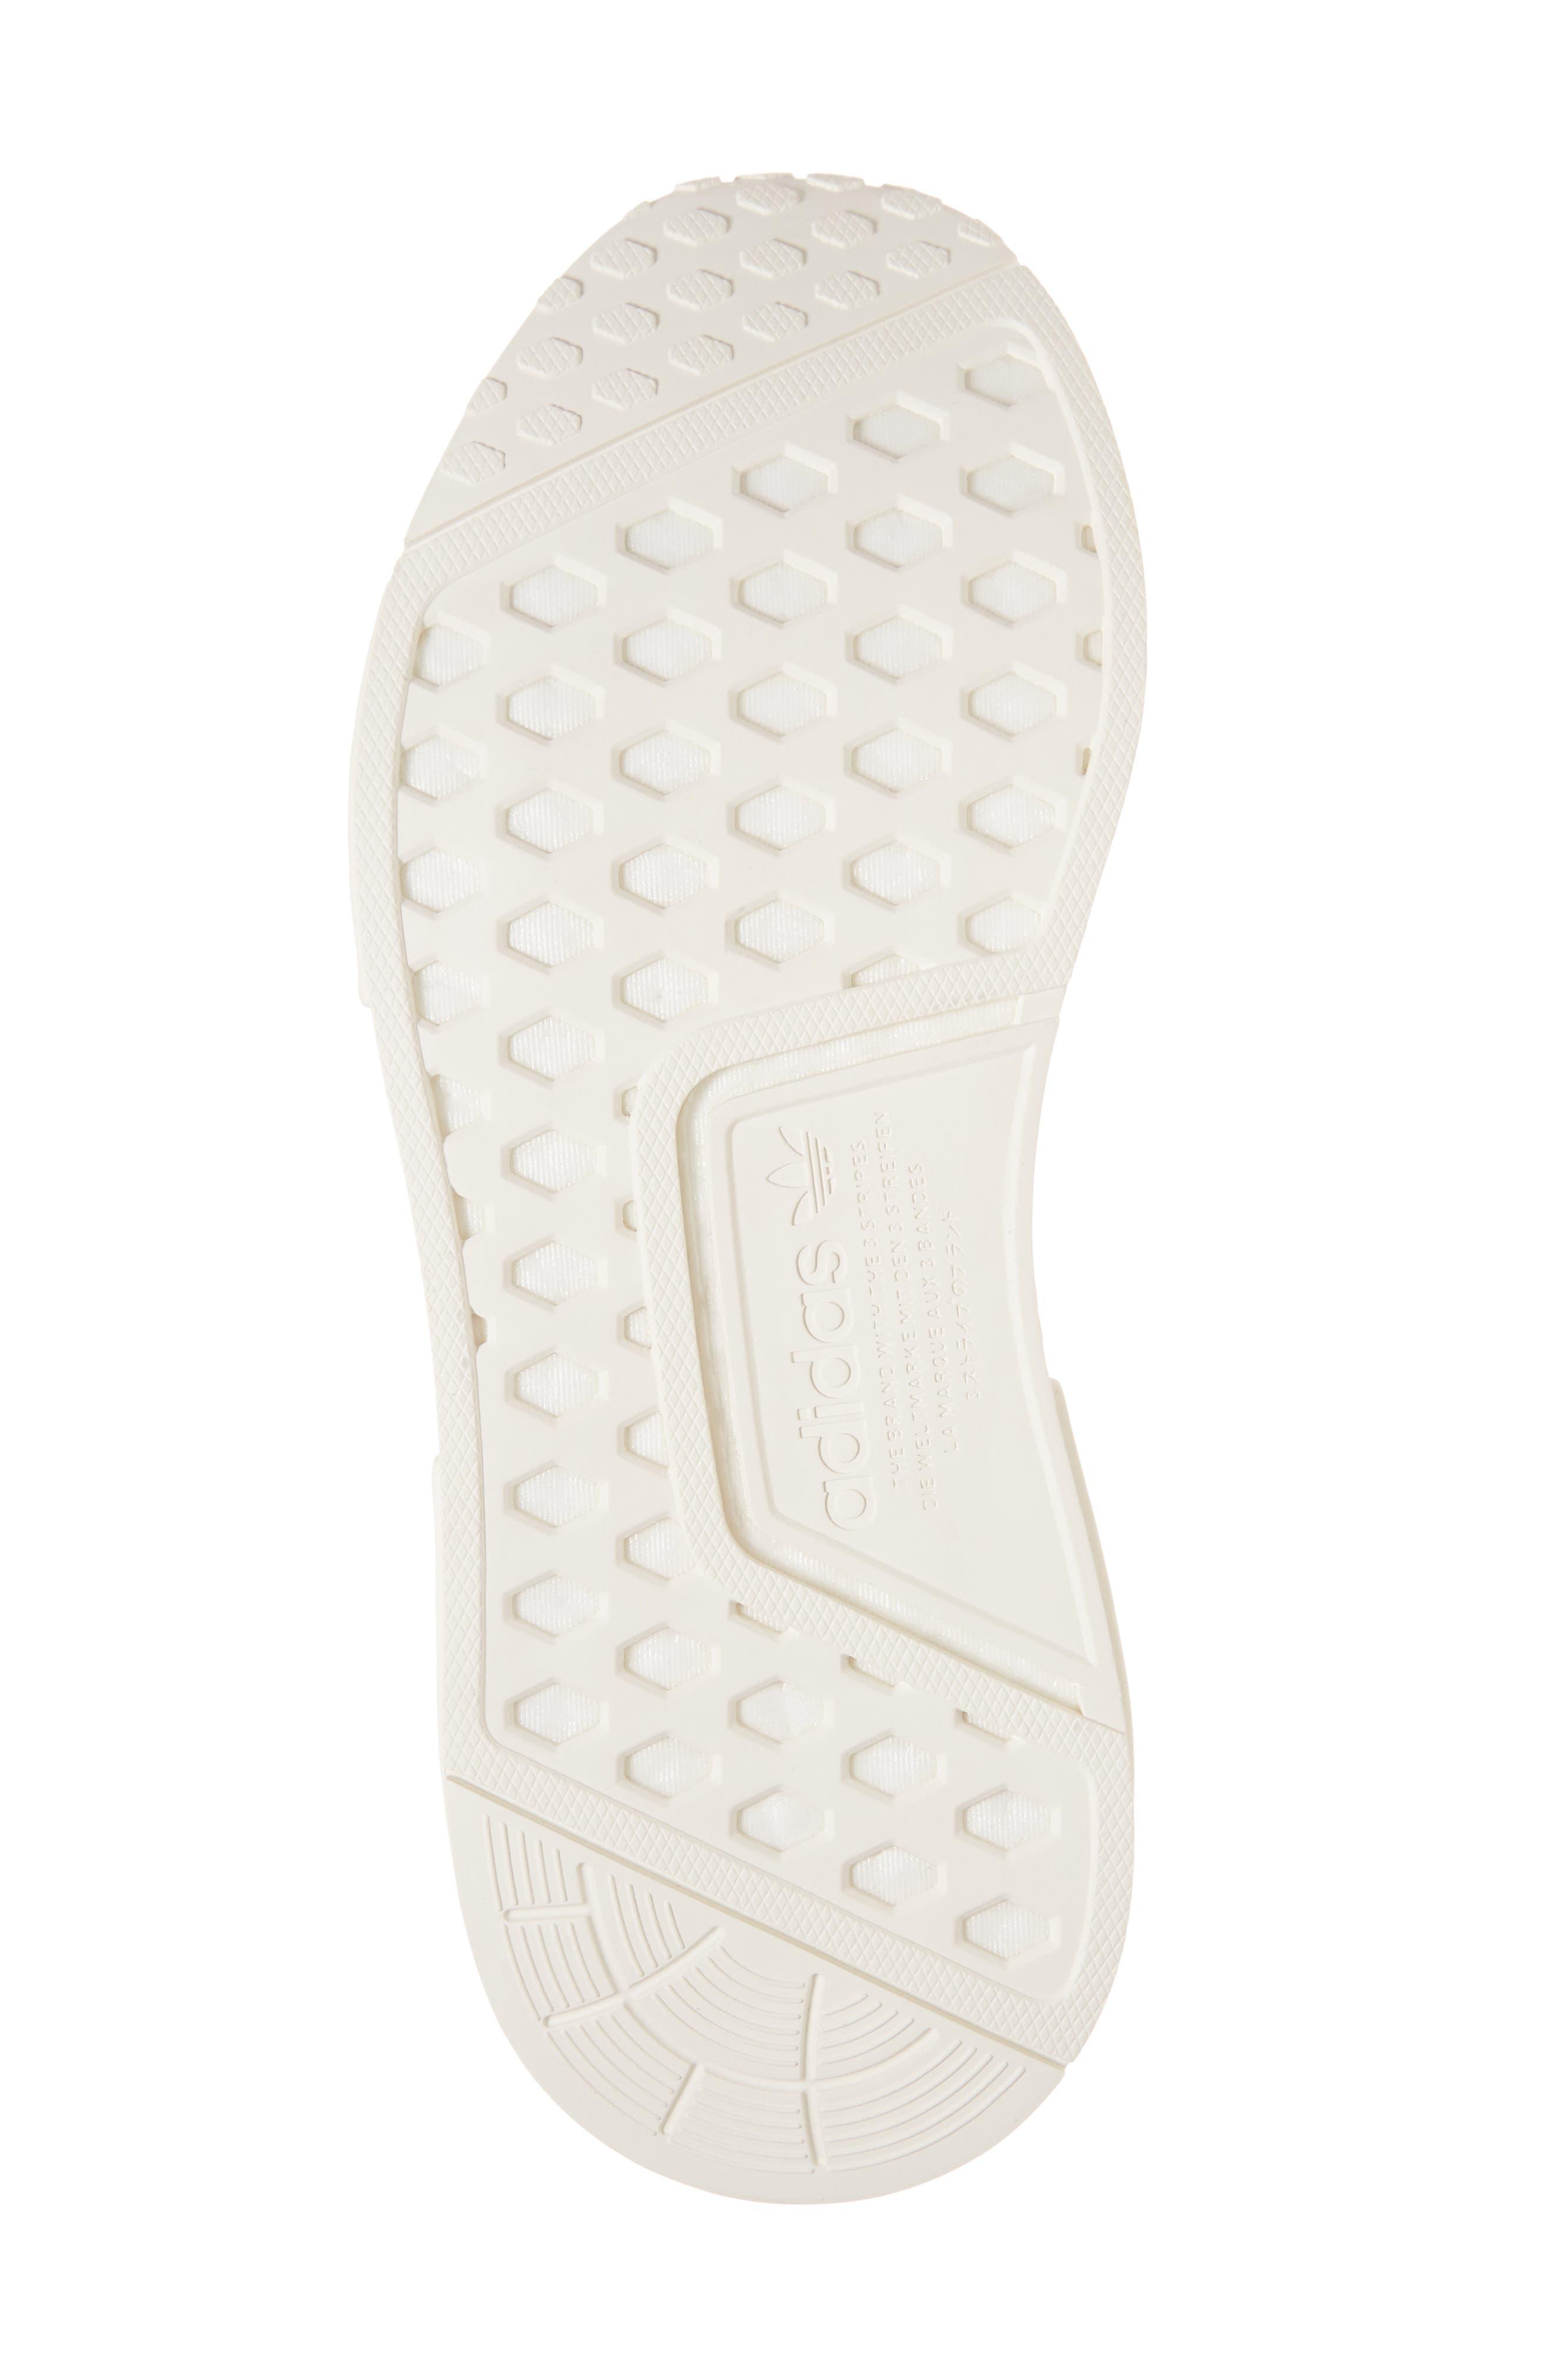 NMD_CS1 Primeknit Sneaker,                             Alternate thumbnail 6, color,                             CLOUD WHITE/ CLEAR ORANGE